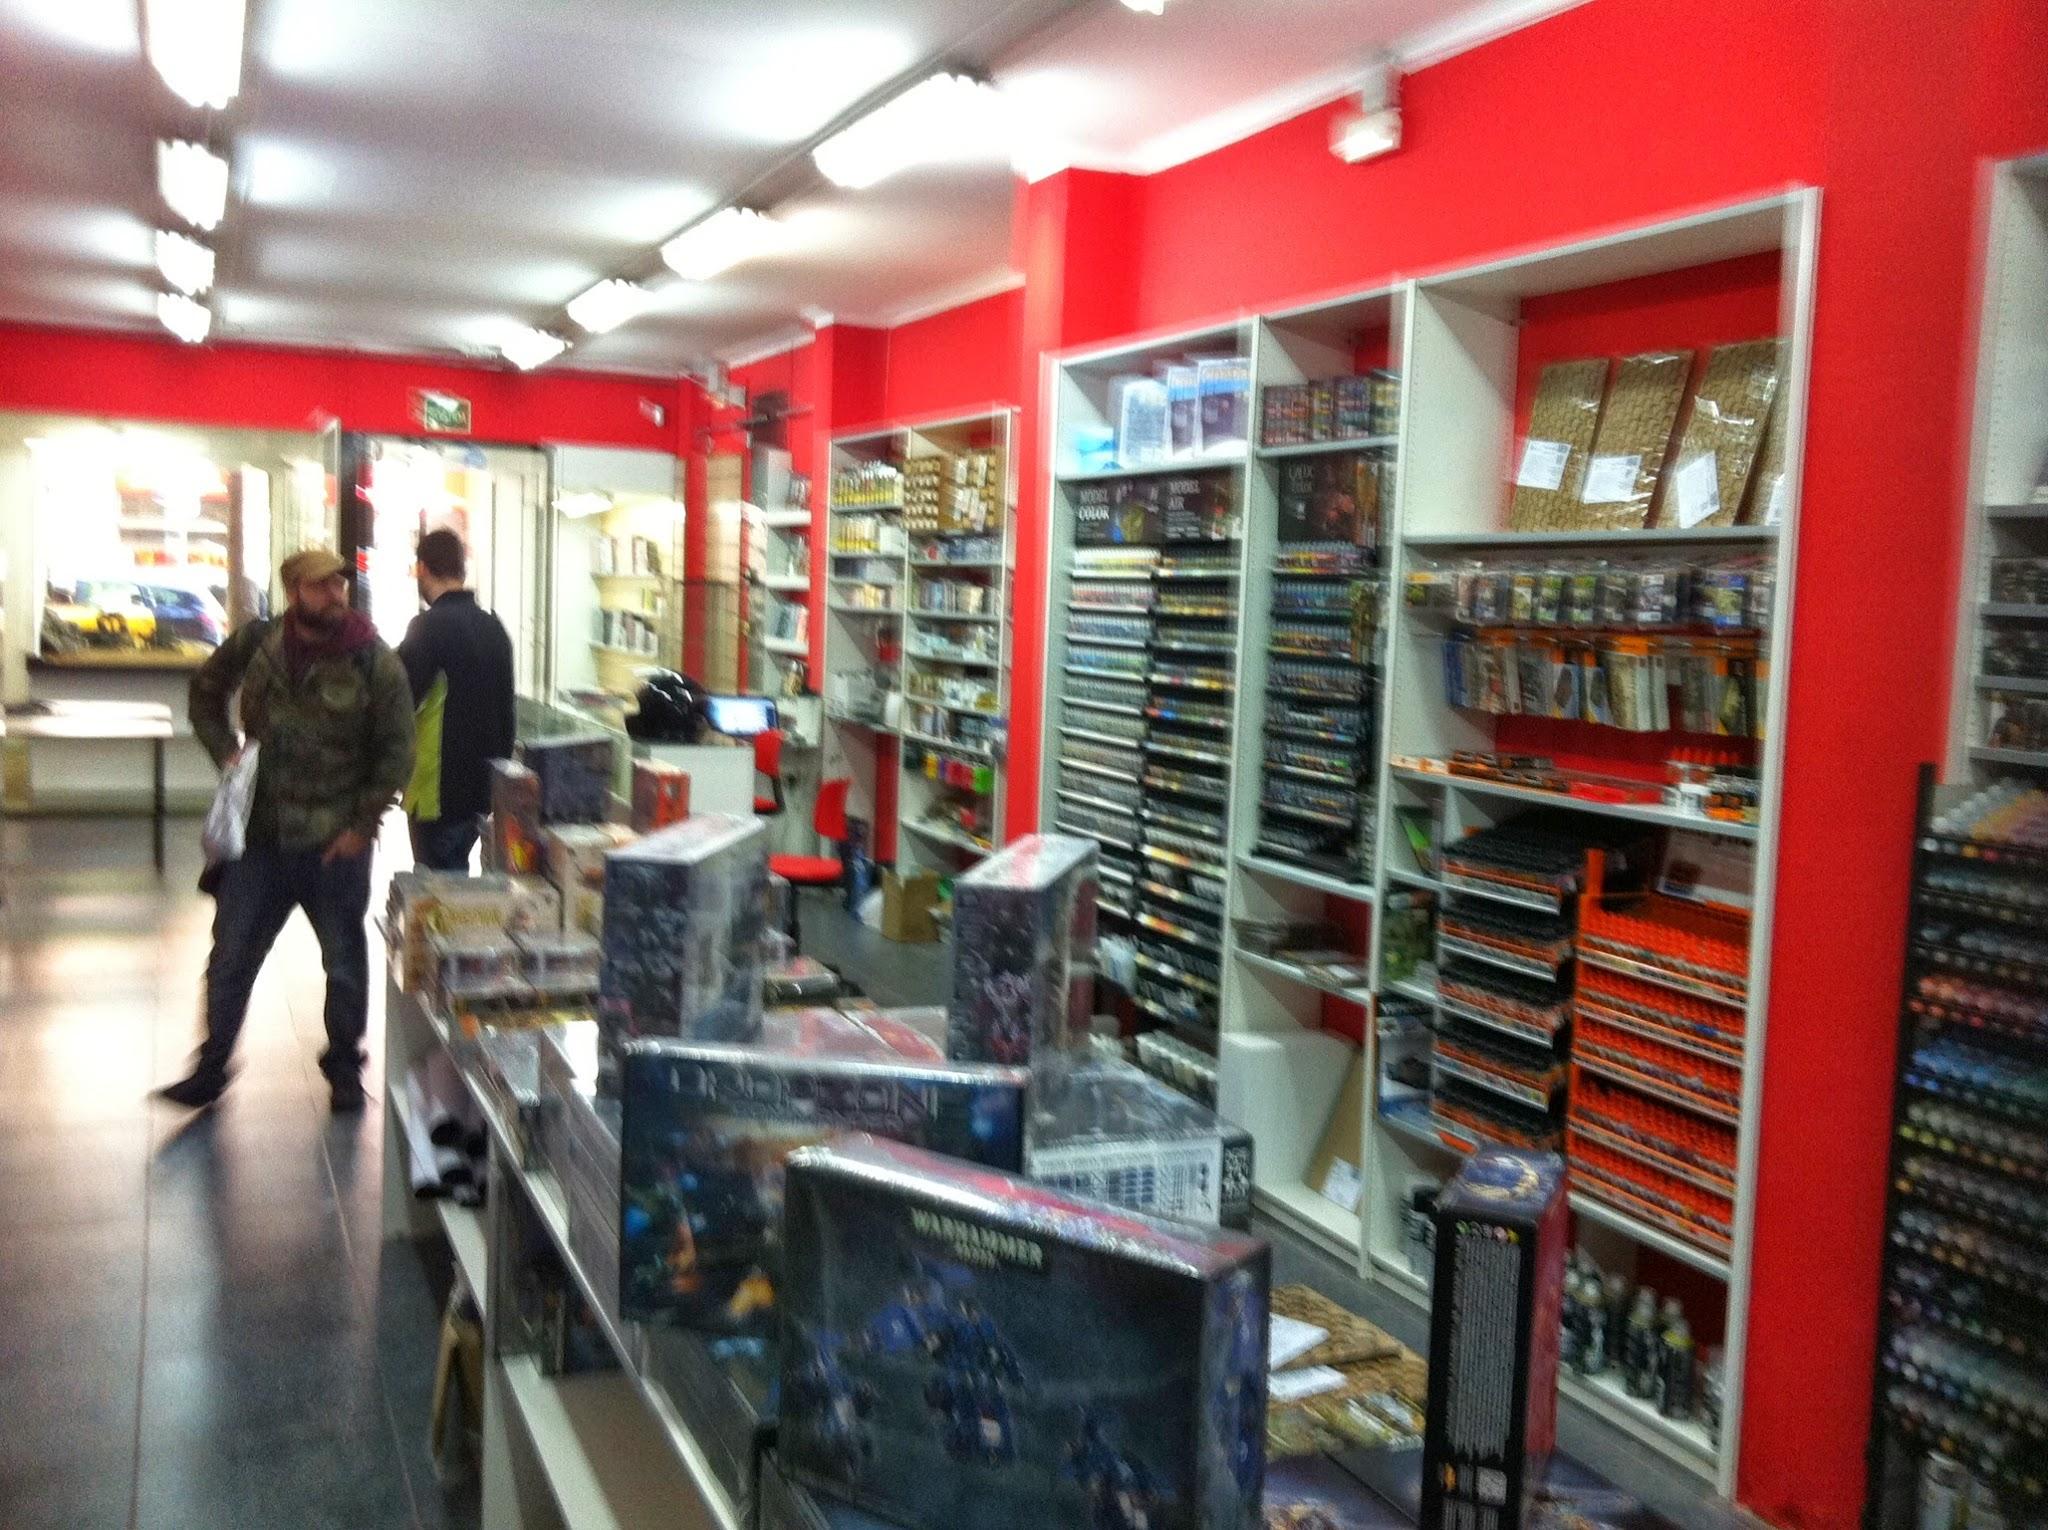 Barcelona, tiendas, tiendas frikis, Gigamesh, Goblin Trader, miniaturas, wargames, literatura, literatura fantástica, Sci fi, horror, Crying Grumpies, Crying Grumpies